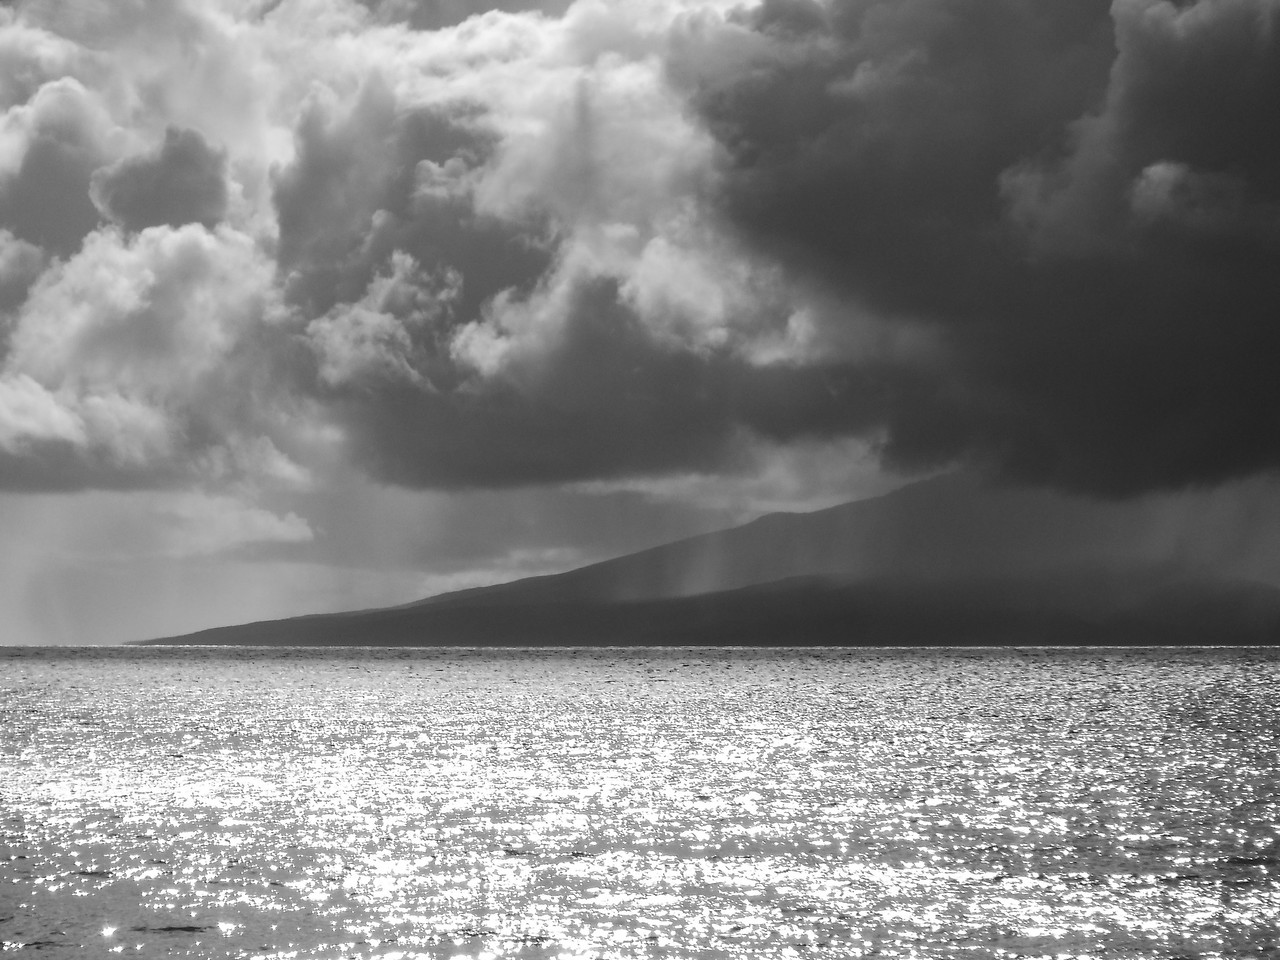 Sun Through the Rain, Lanai